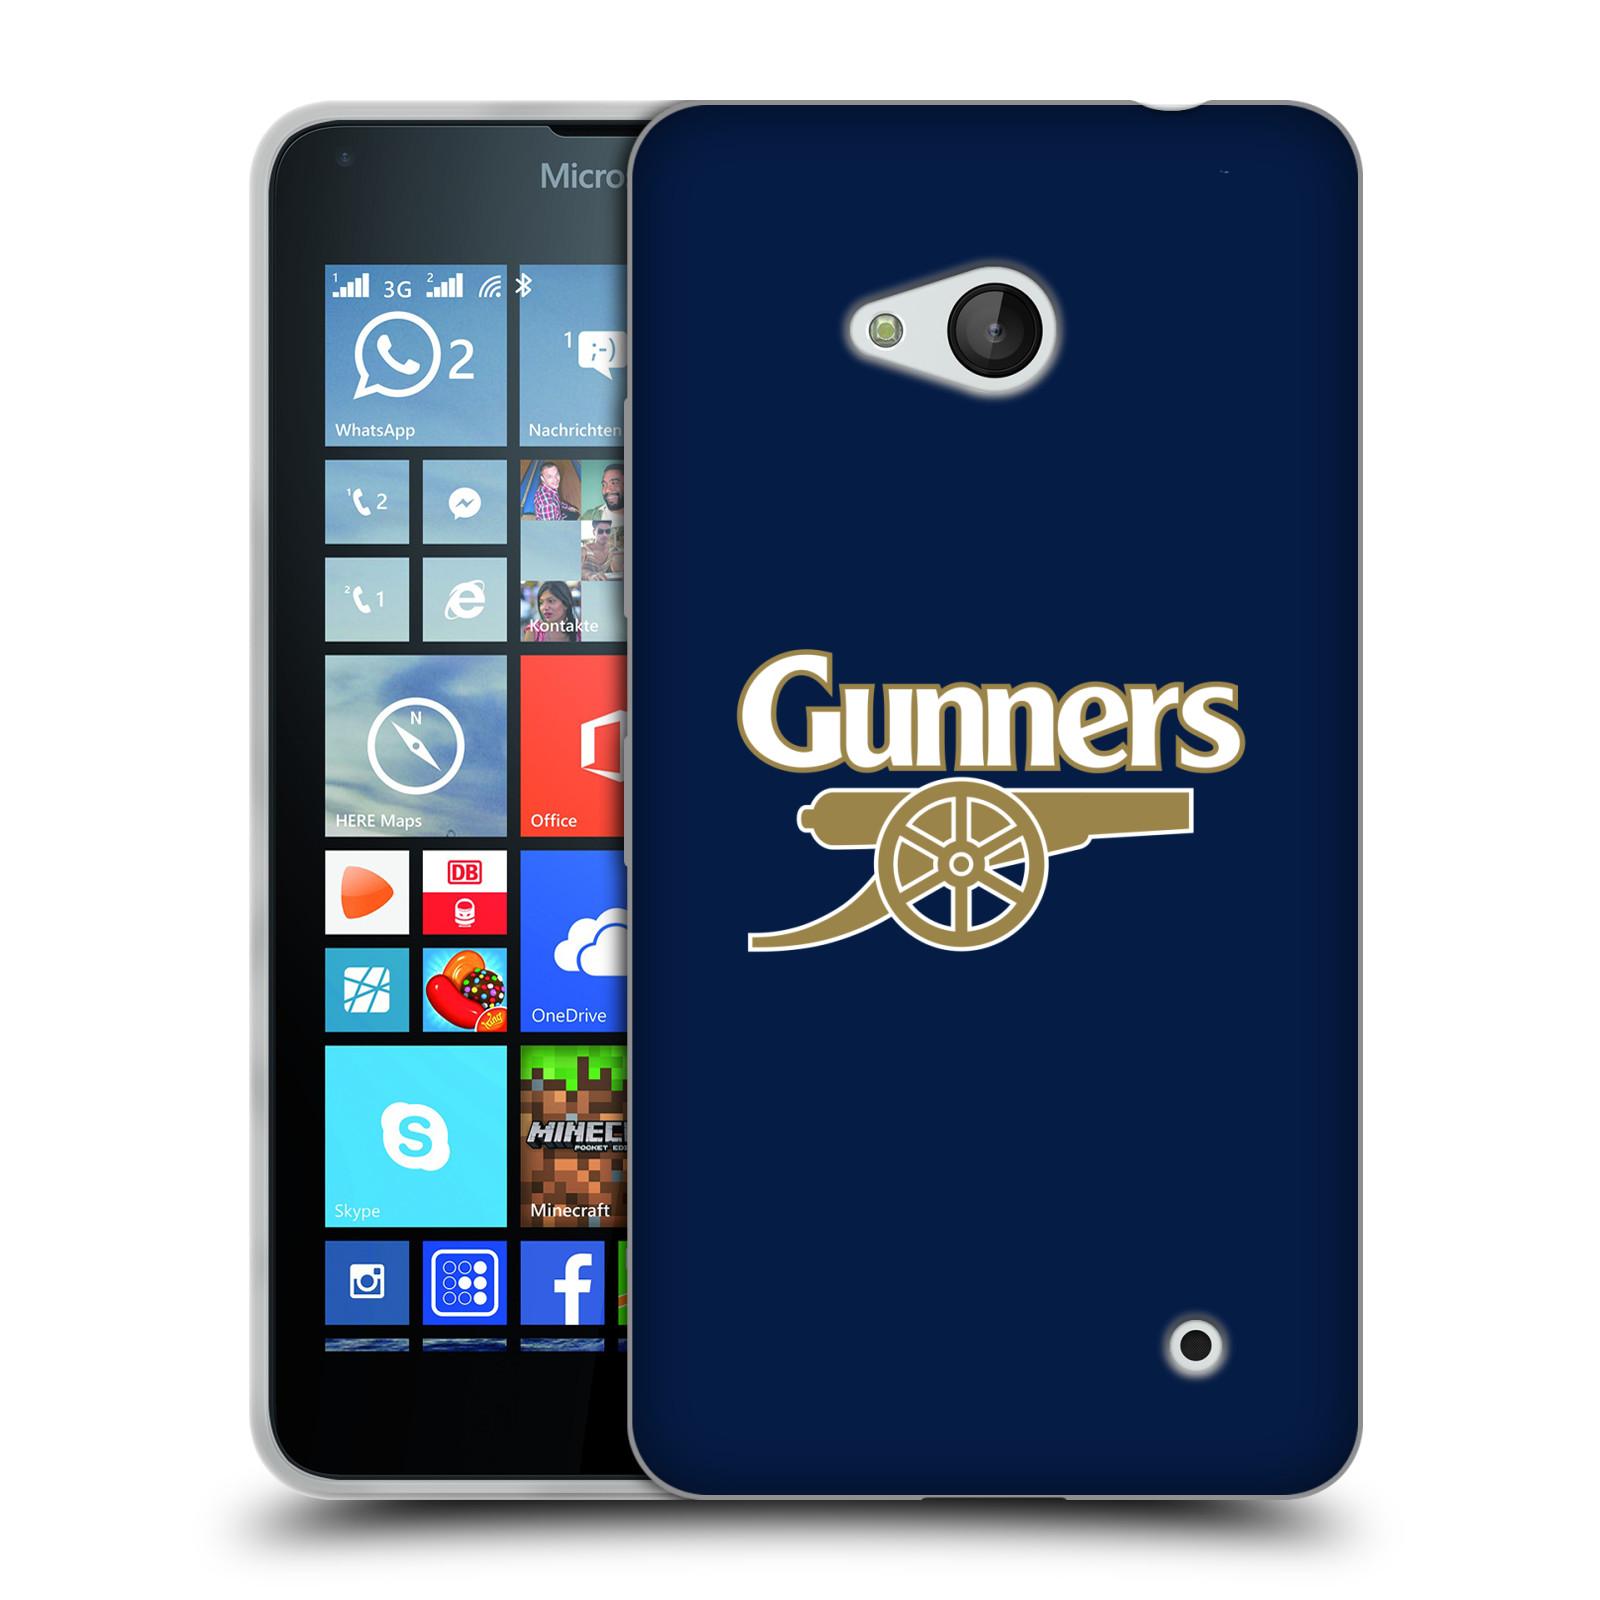 Silikonové pouzdro na mobil Microsoft Lumia 640 - Head Case - Arsenal FC - Gunners